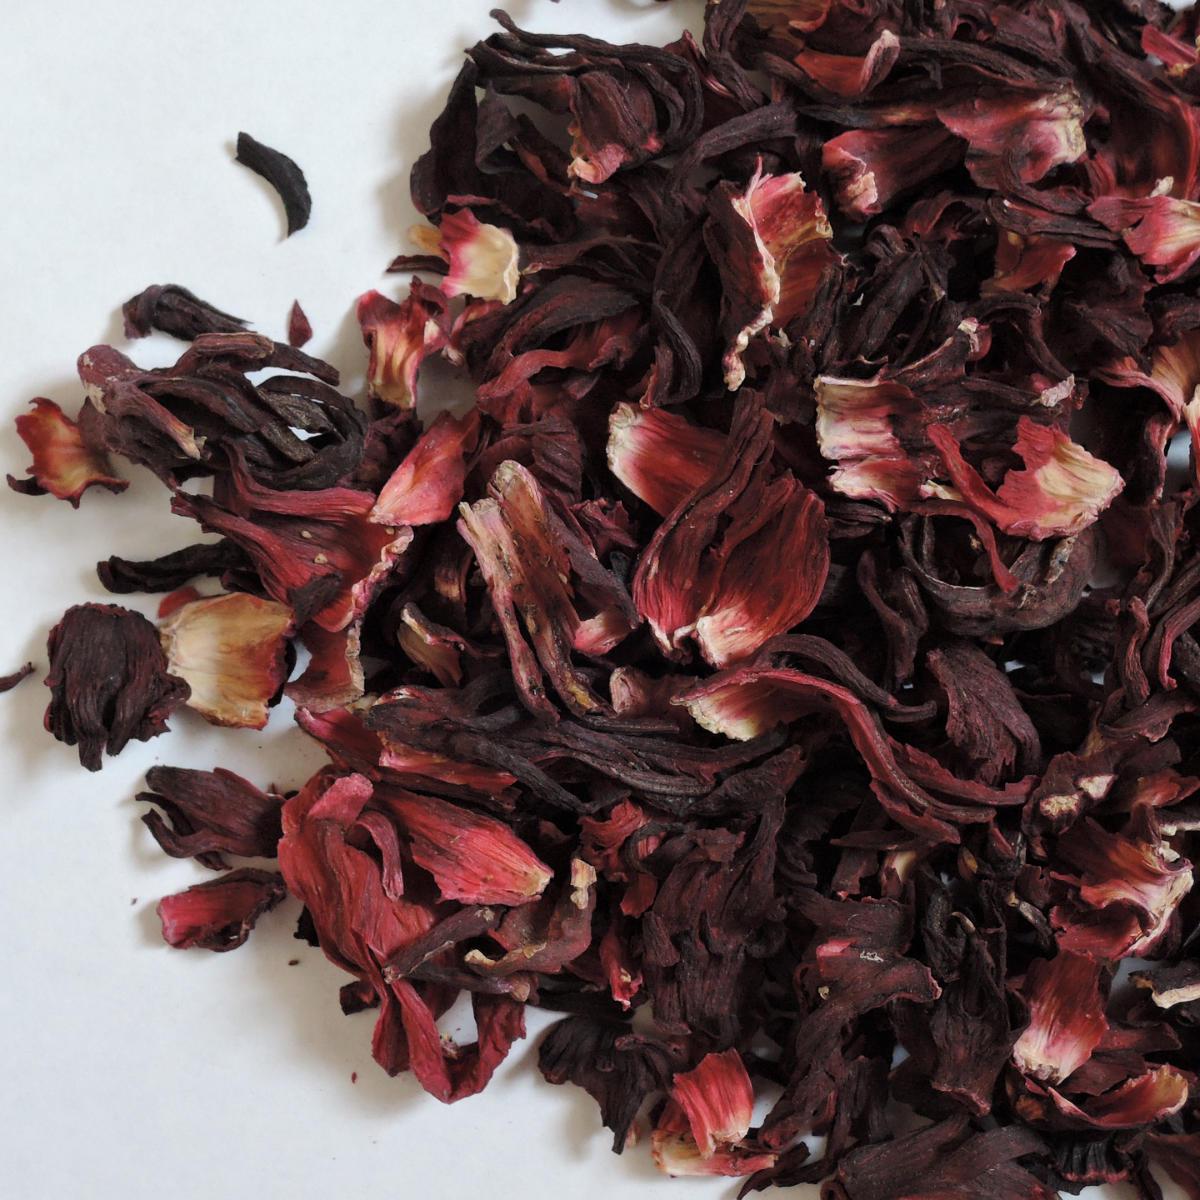 Pétalas secas de flor de hibisco